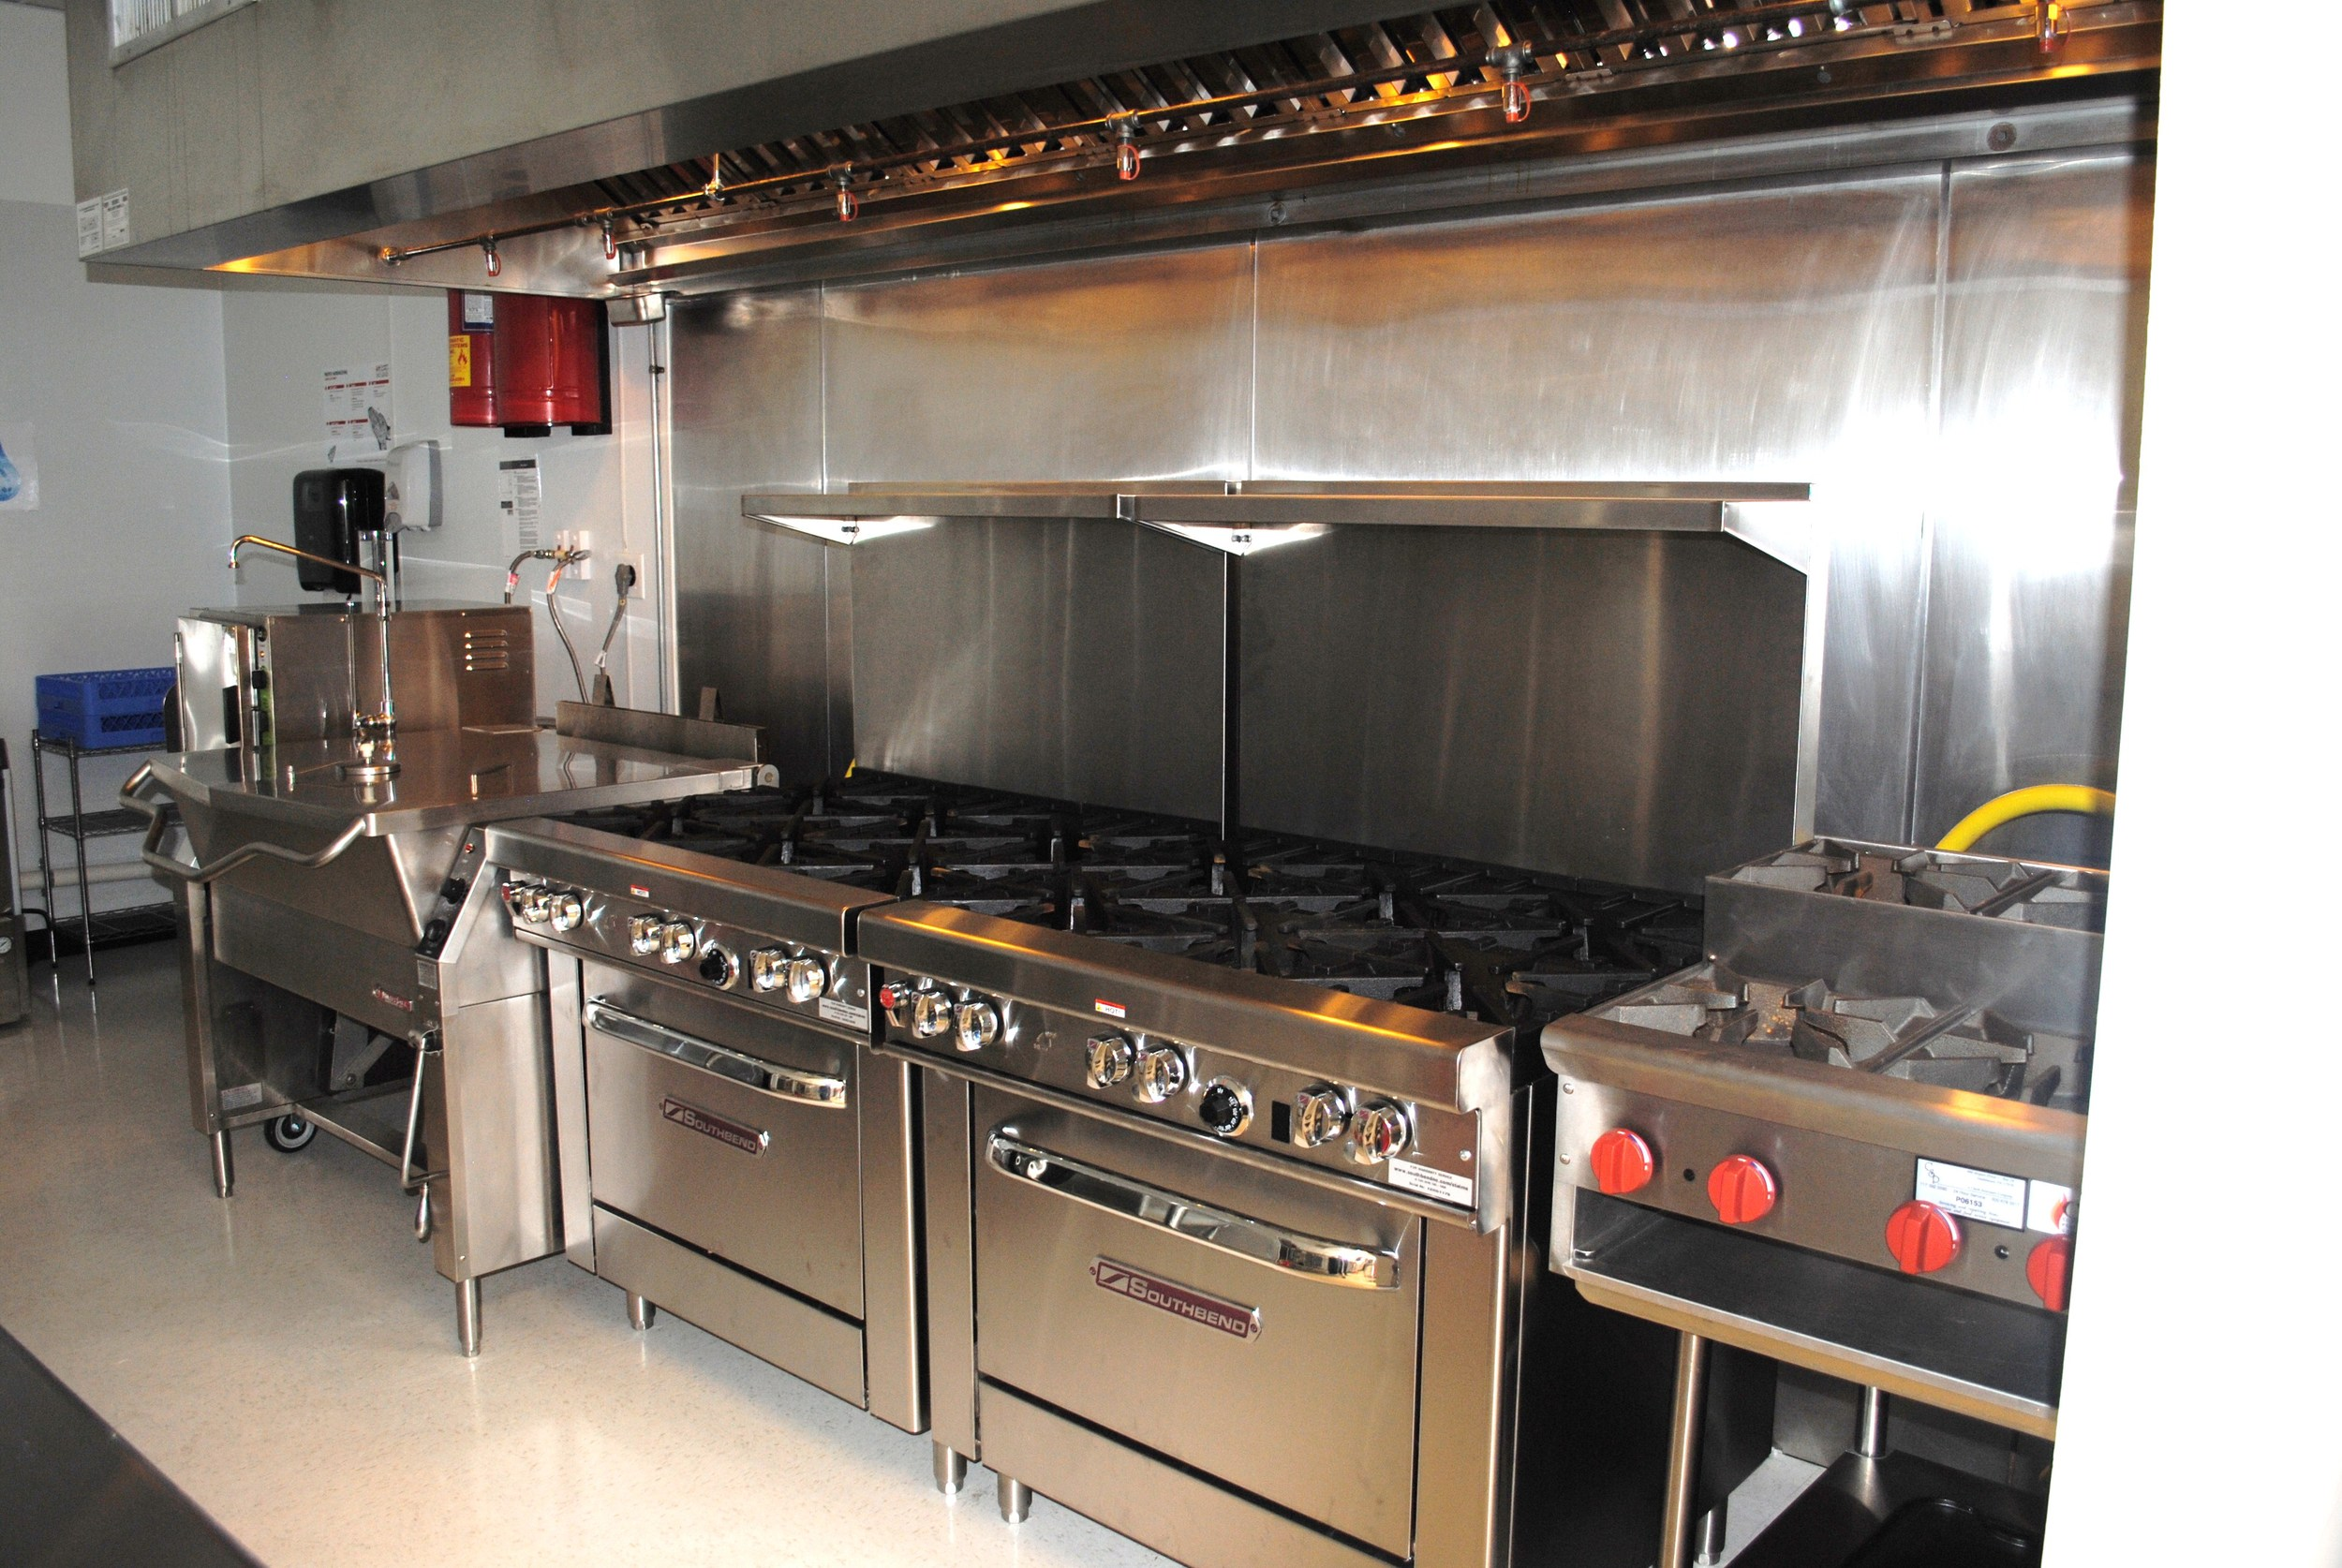 Chef Kitchen Creative Chef Kitchens 888 625 2111creative Chef Kitchens Llc